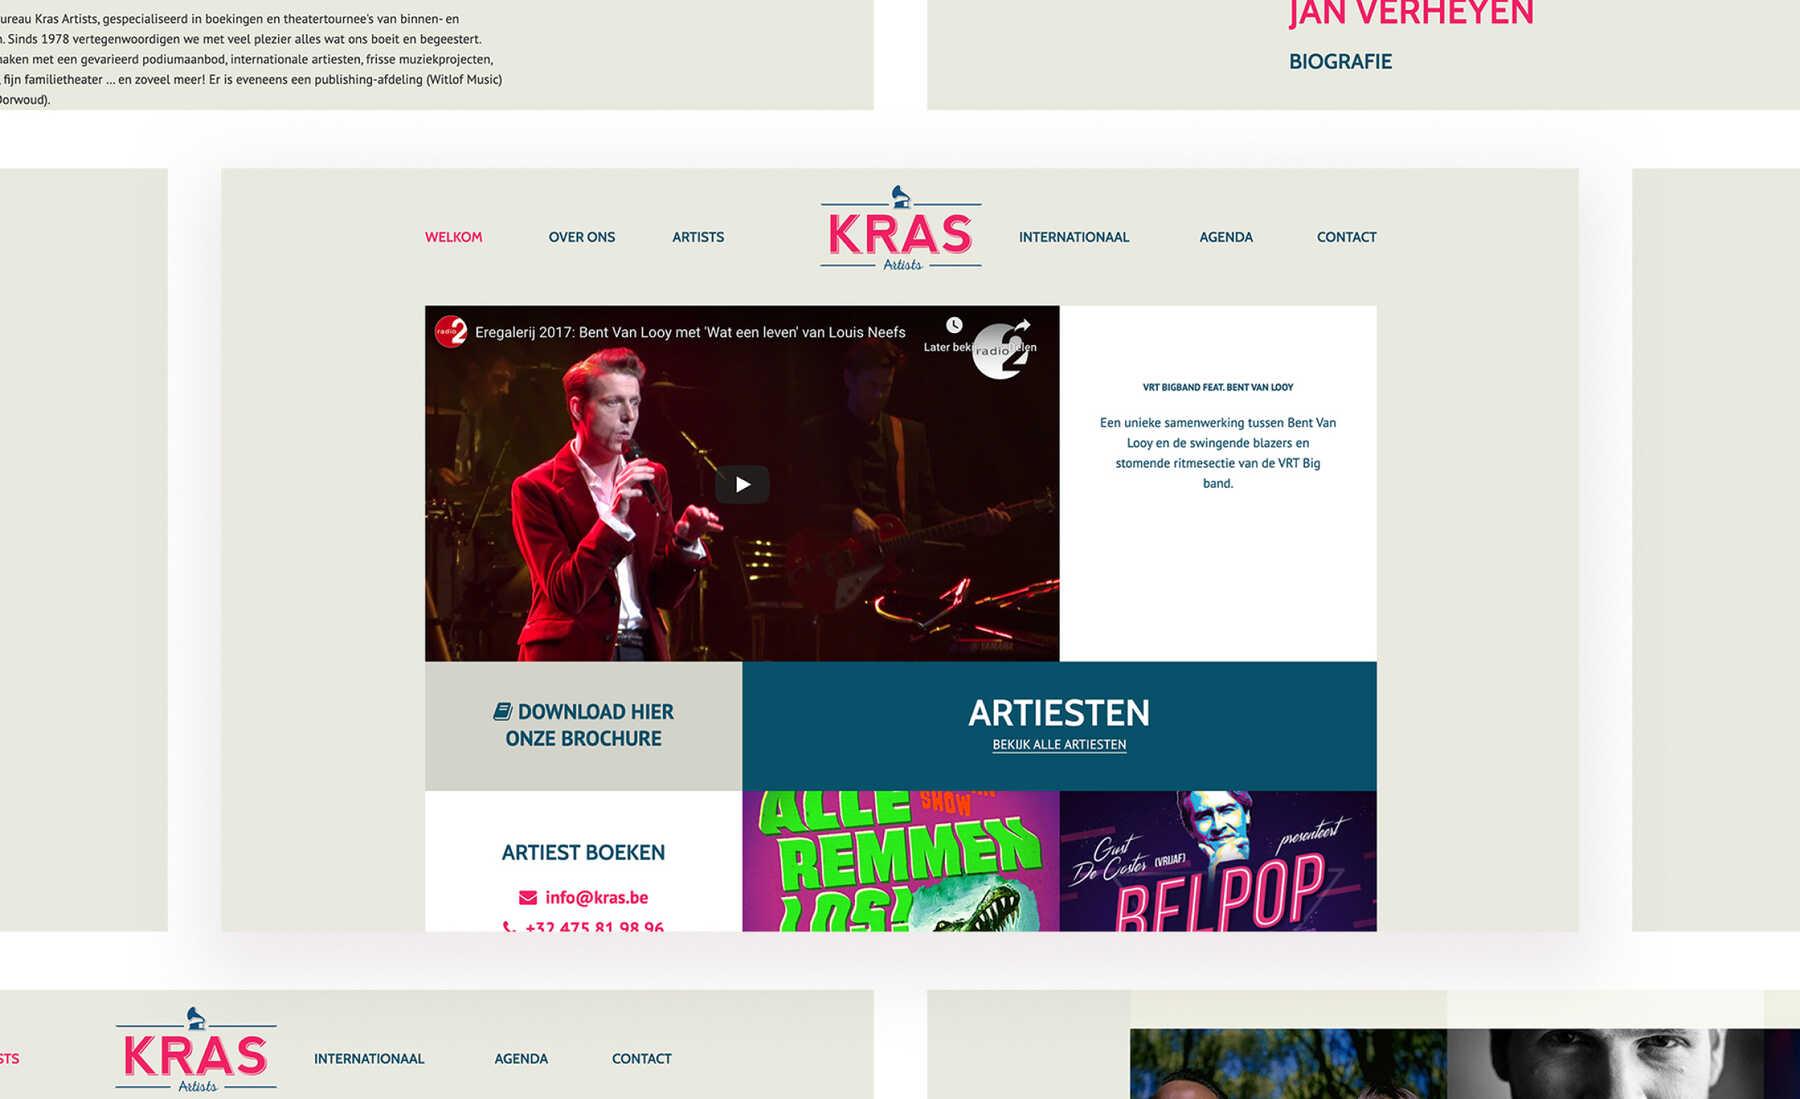 Kras Artists artiesten